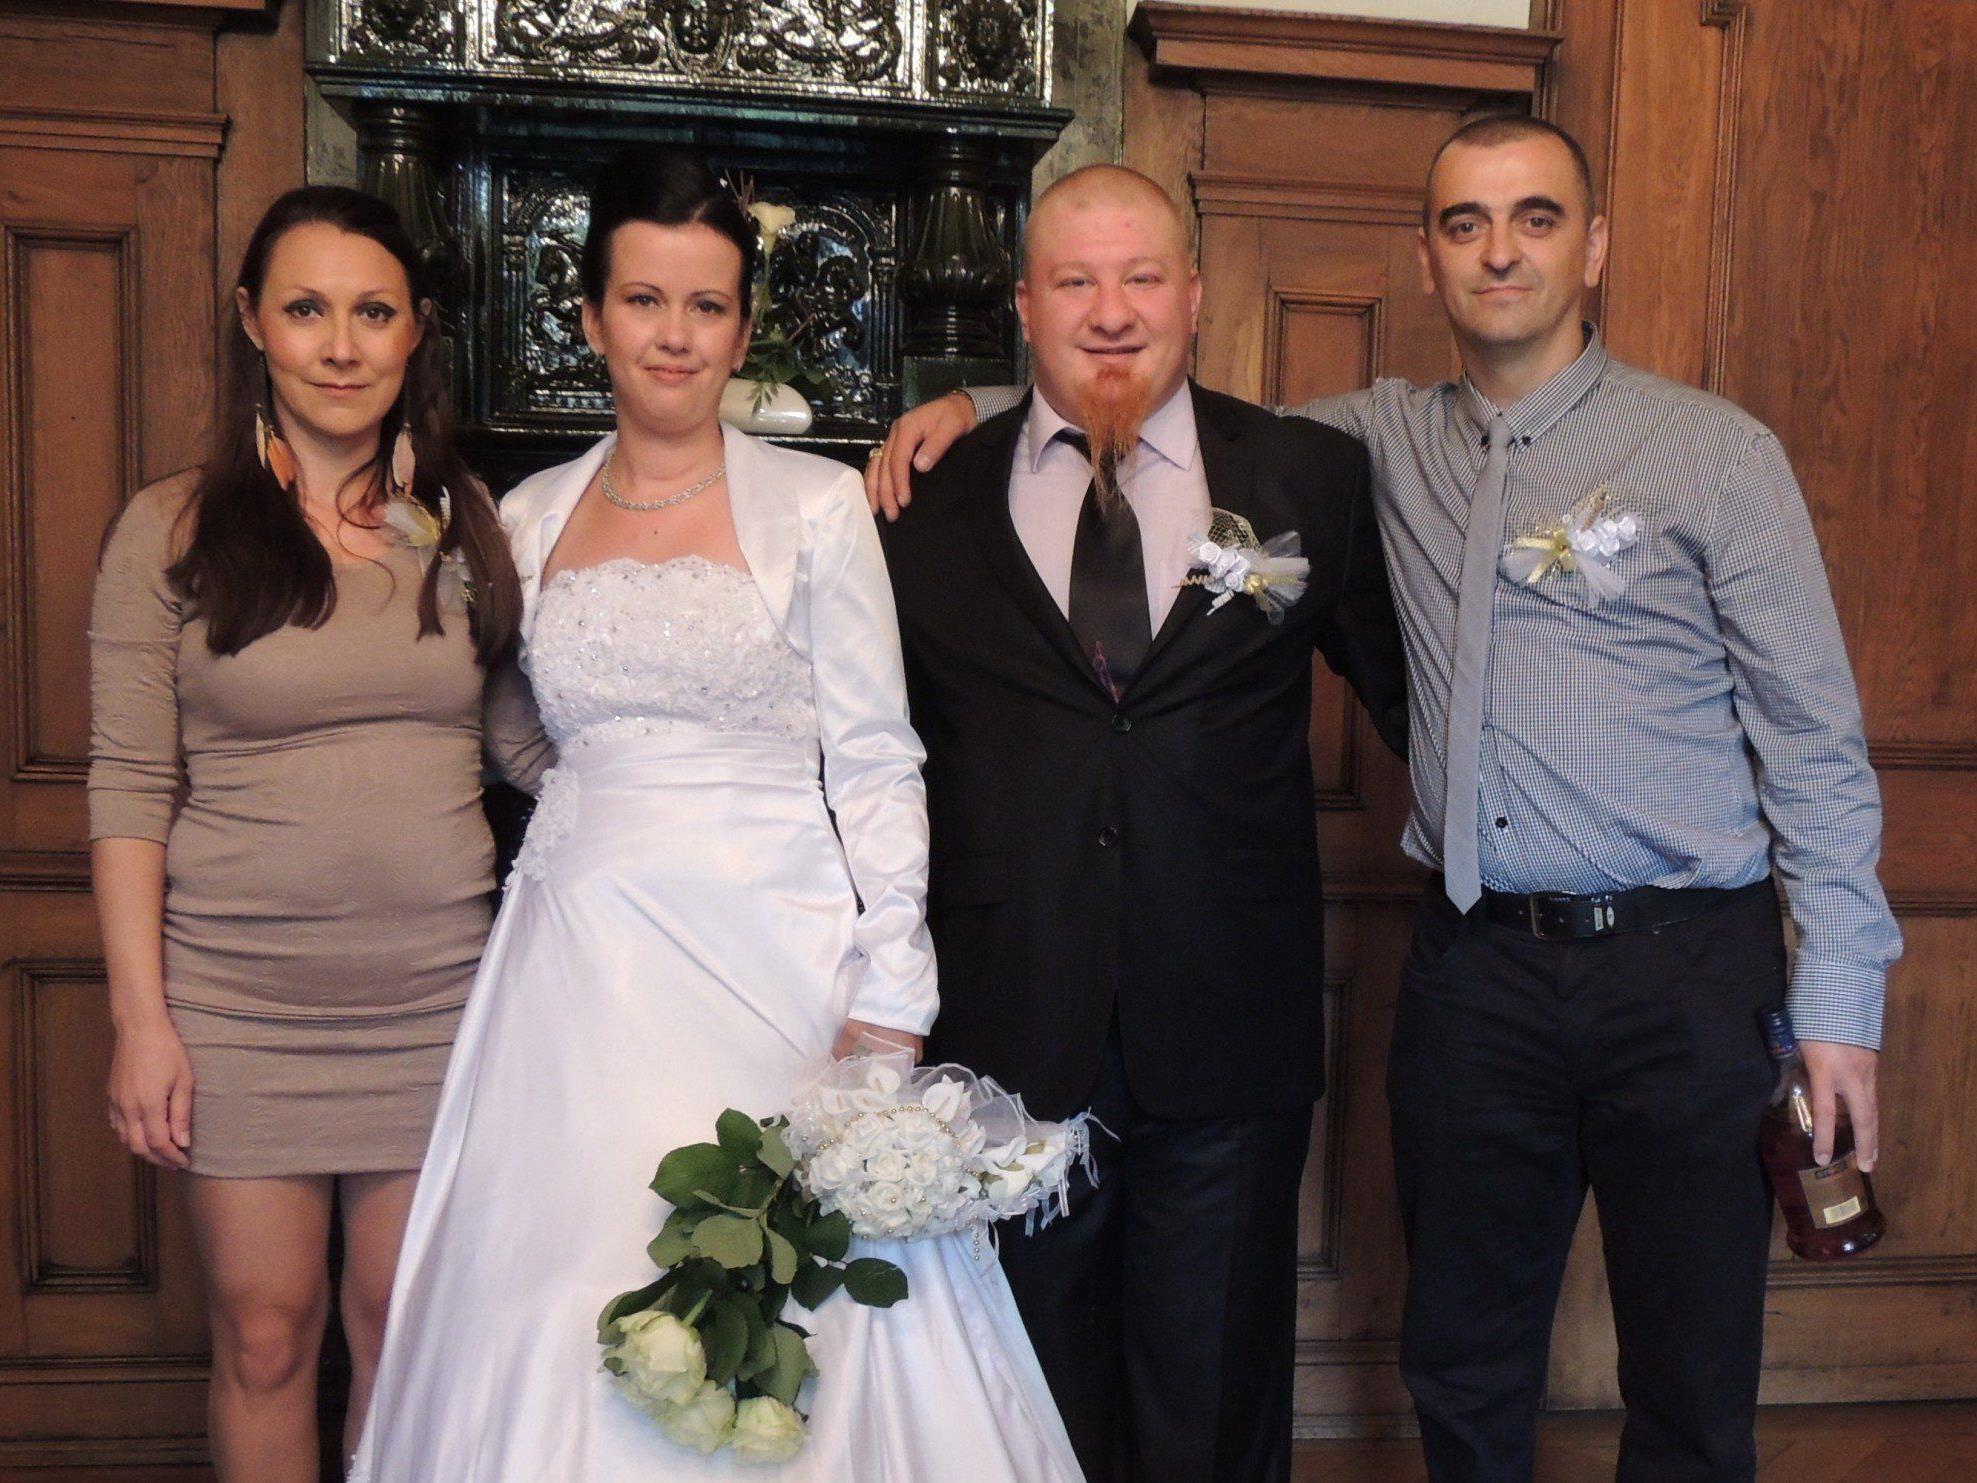 Milena Stevanović und Mile Radivojša haben geheiratet.